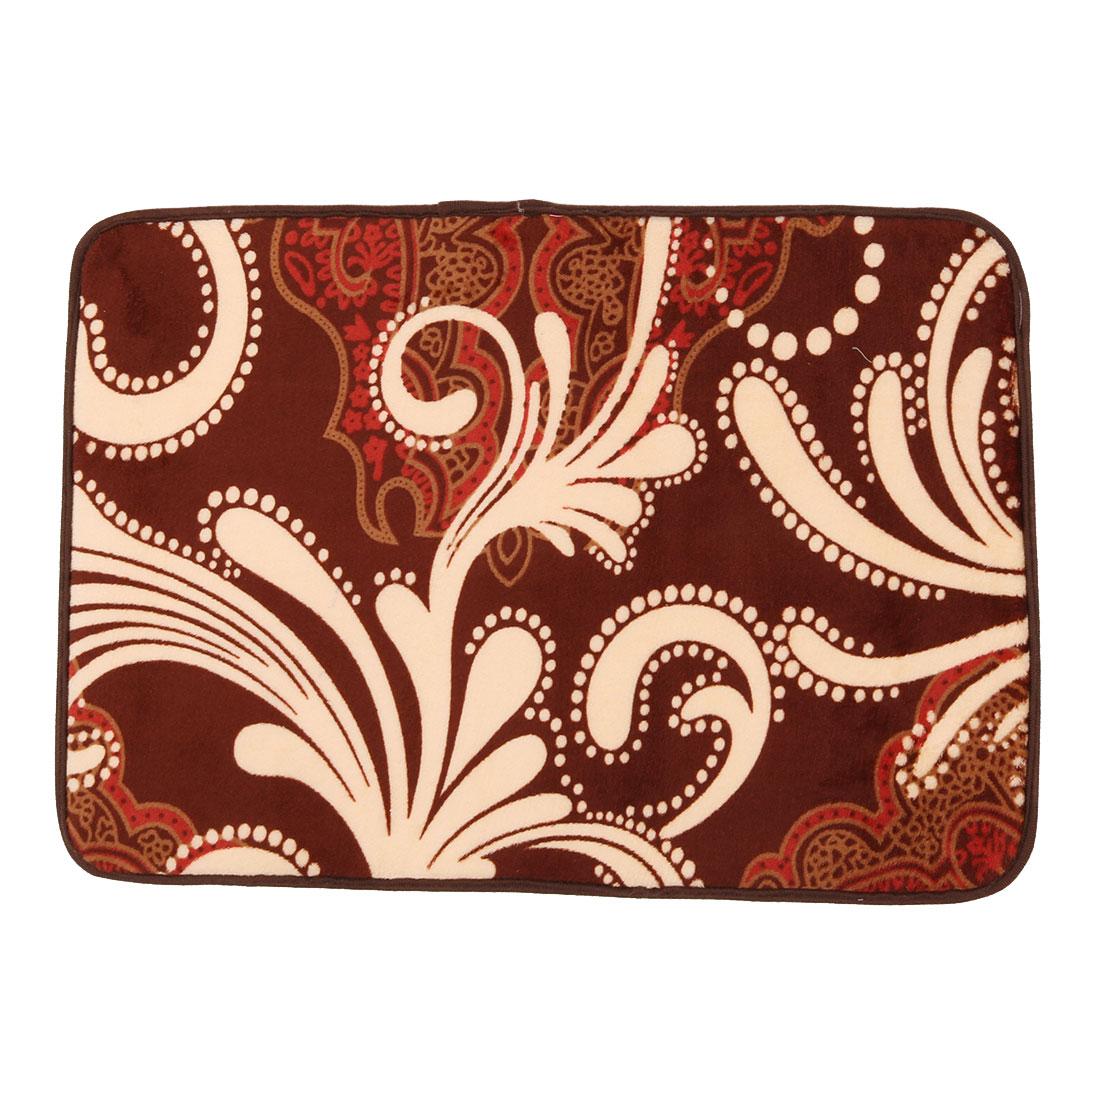 Household Coral Fleece Vine Print Rectangle Washable Floor Carpet Rug Pad Doormat 60 x 40cm